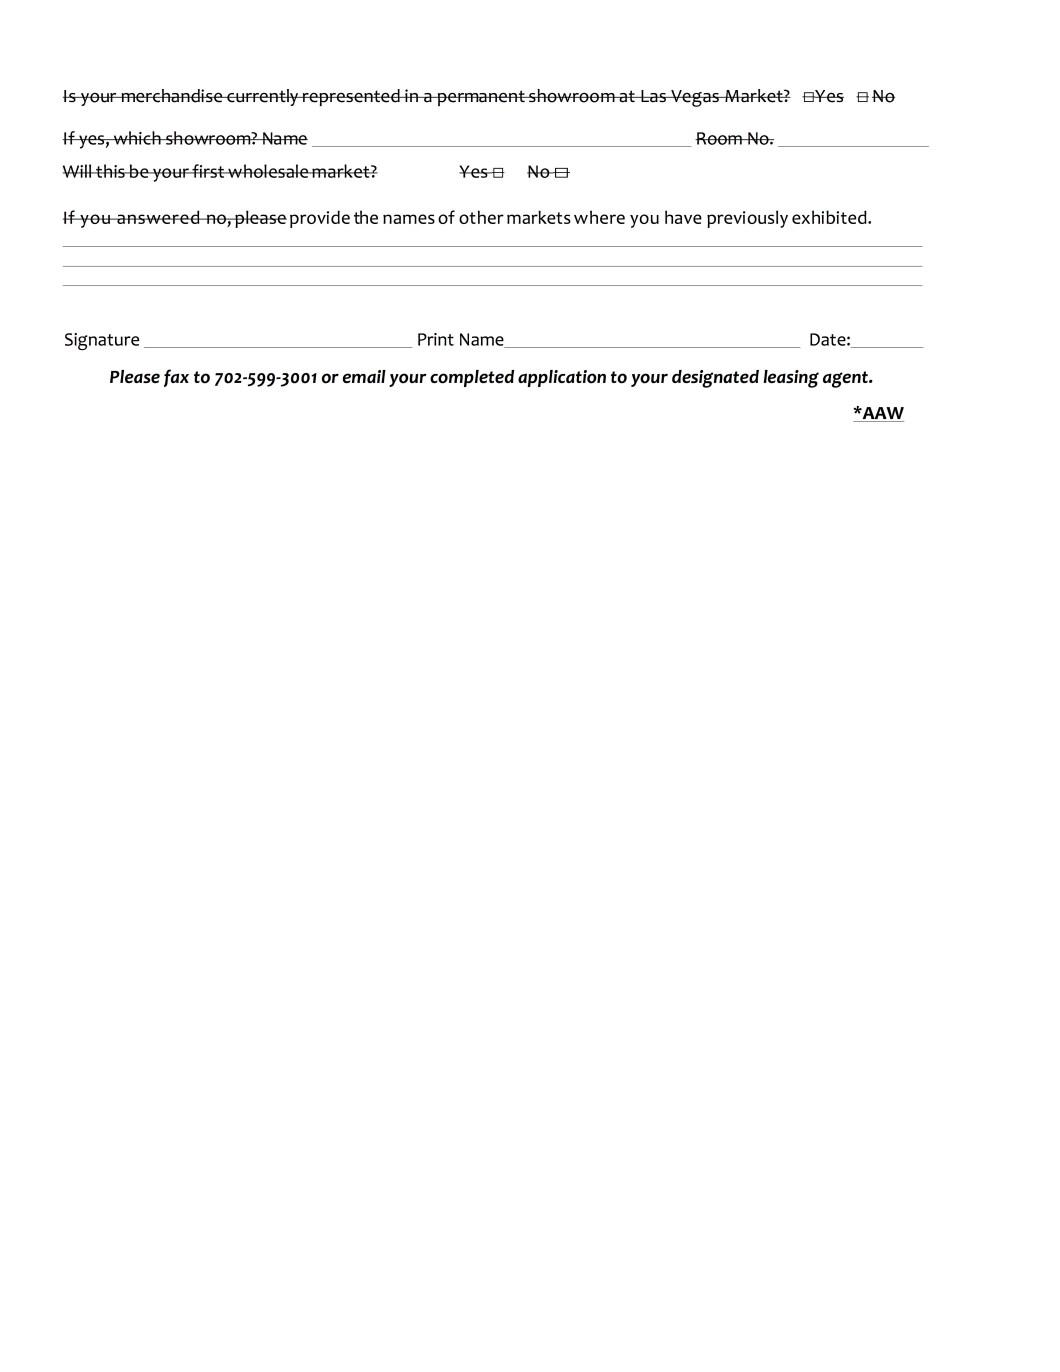 Las Vegas Market Application